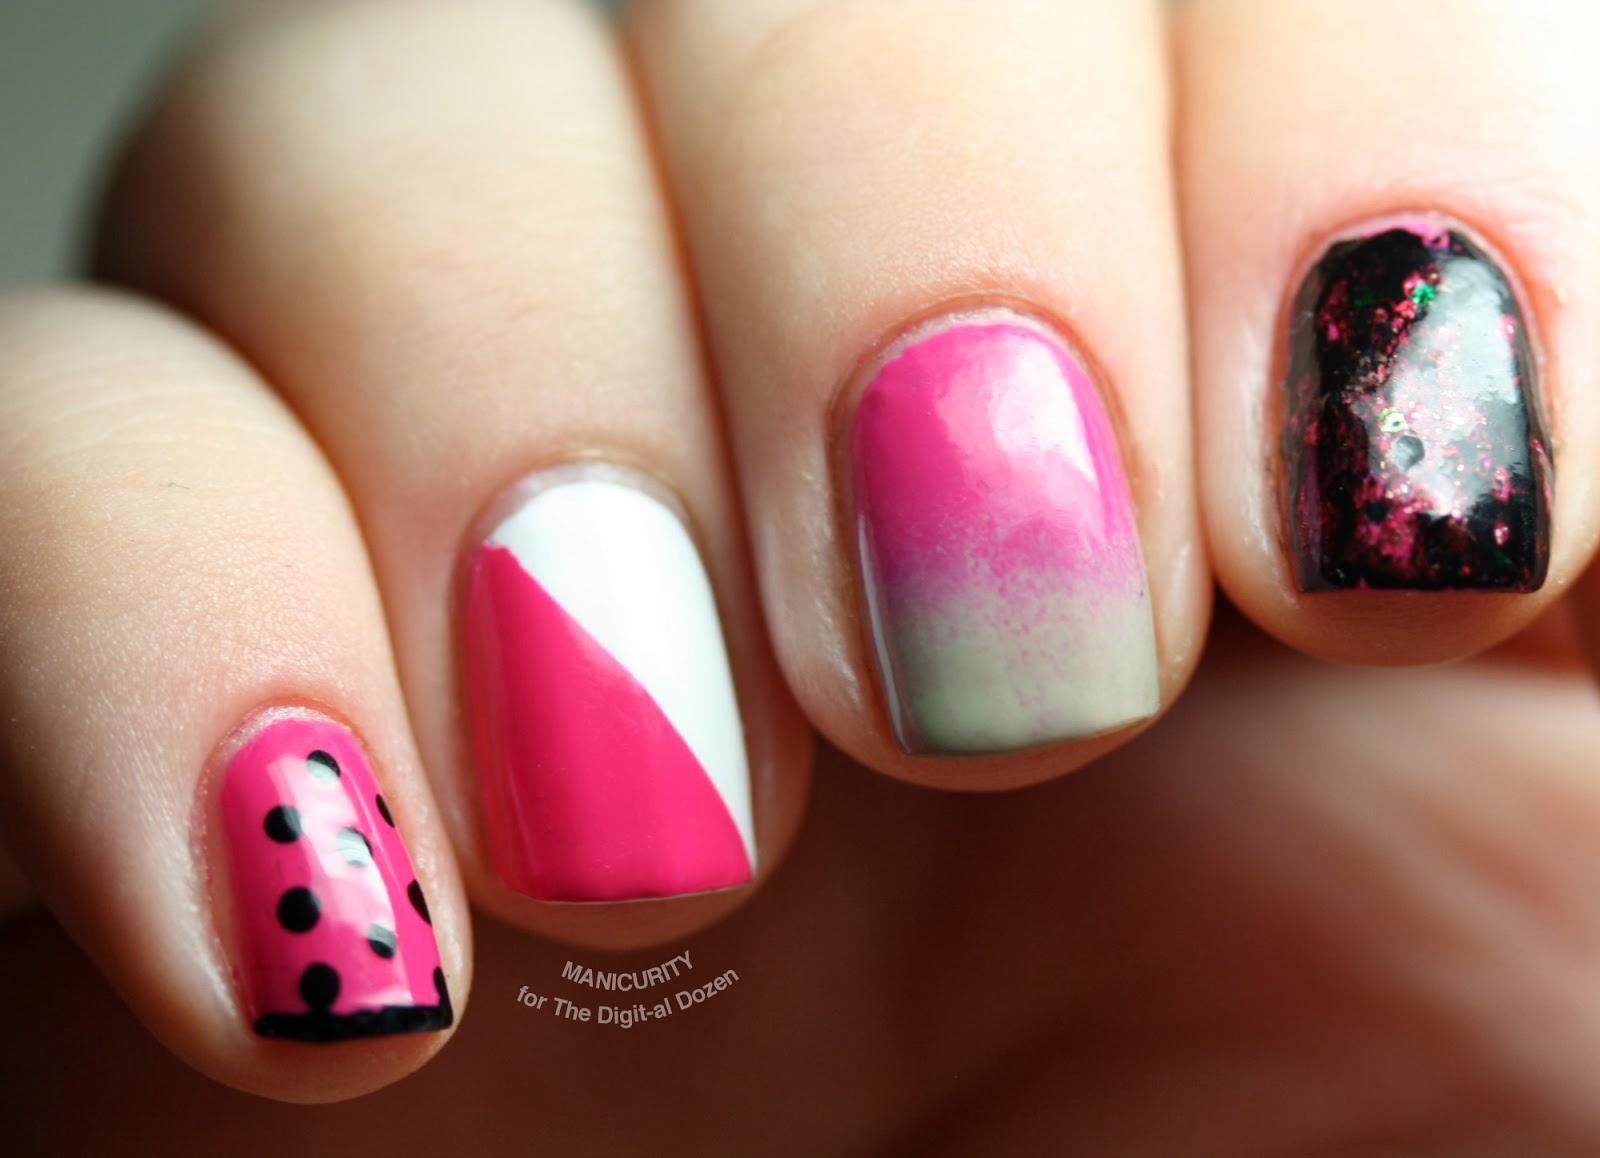 Nail Art Ideas nail art patterns : A Dozen... Easy Nail Art Patterns! - The Digit-al Dozen